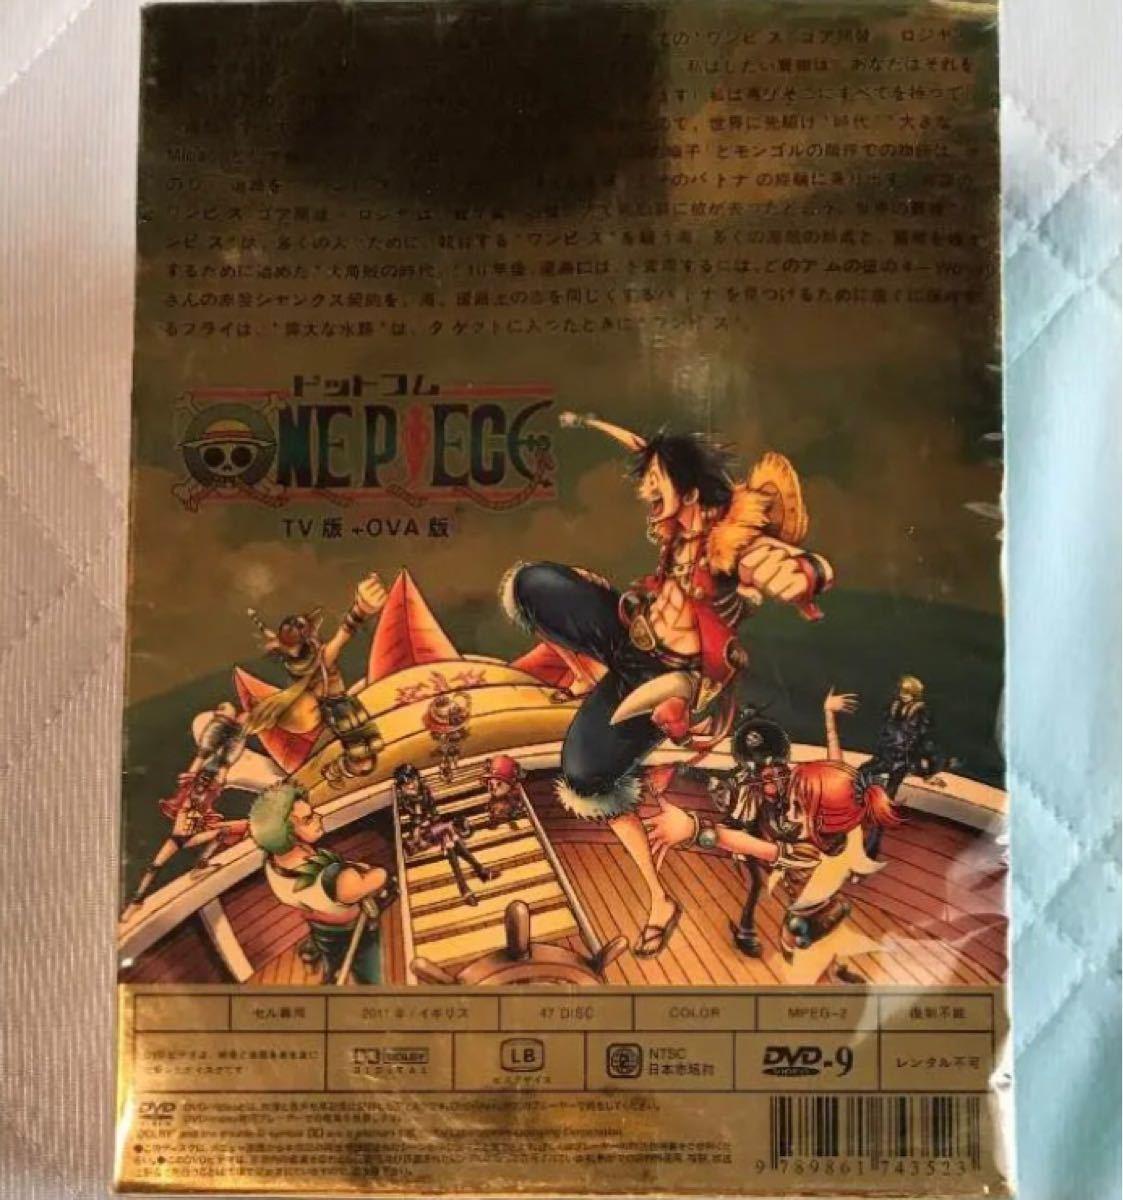 ワンピースTV版+OVA版 47枚組 新品未開封BOX